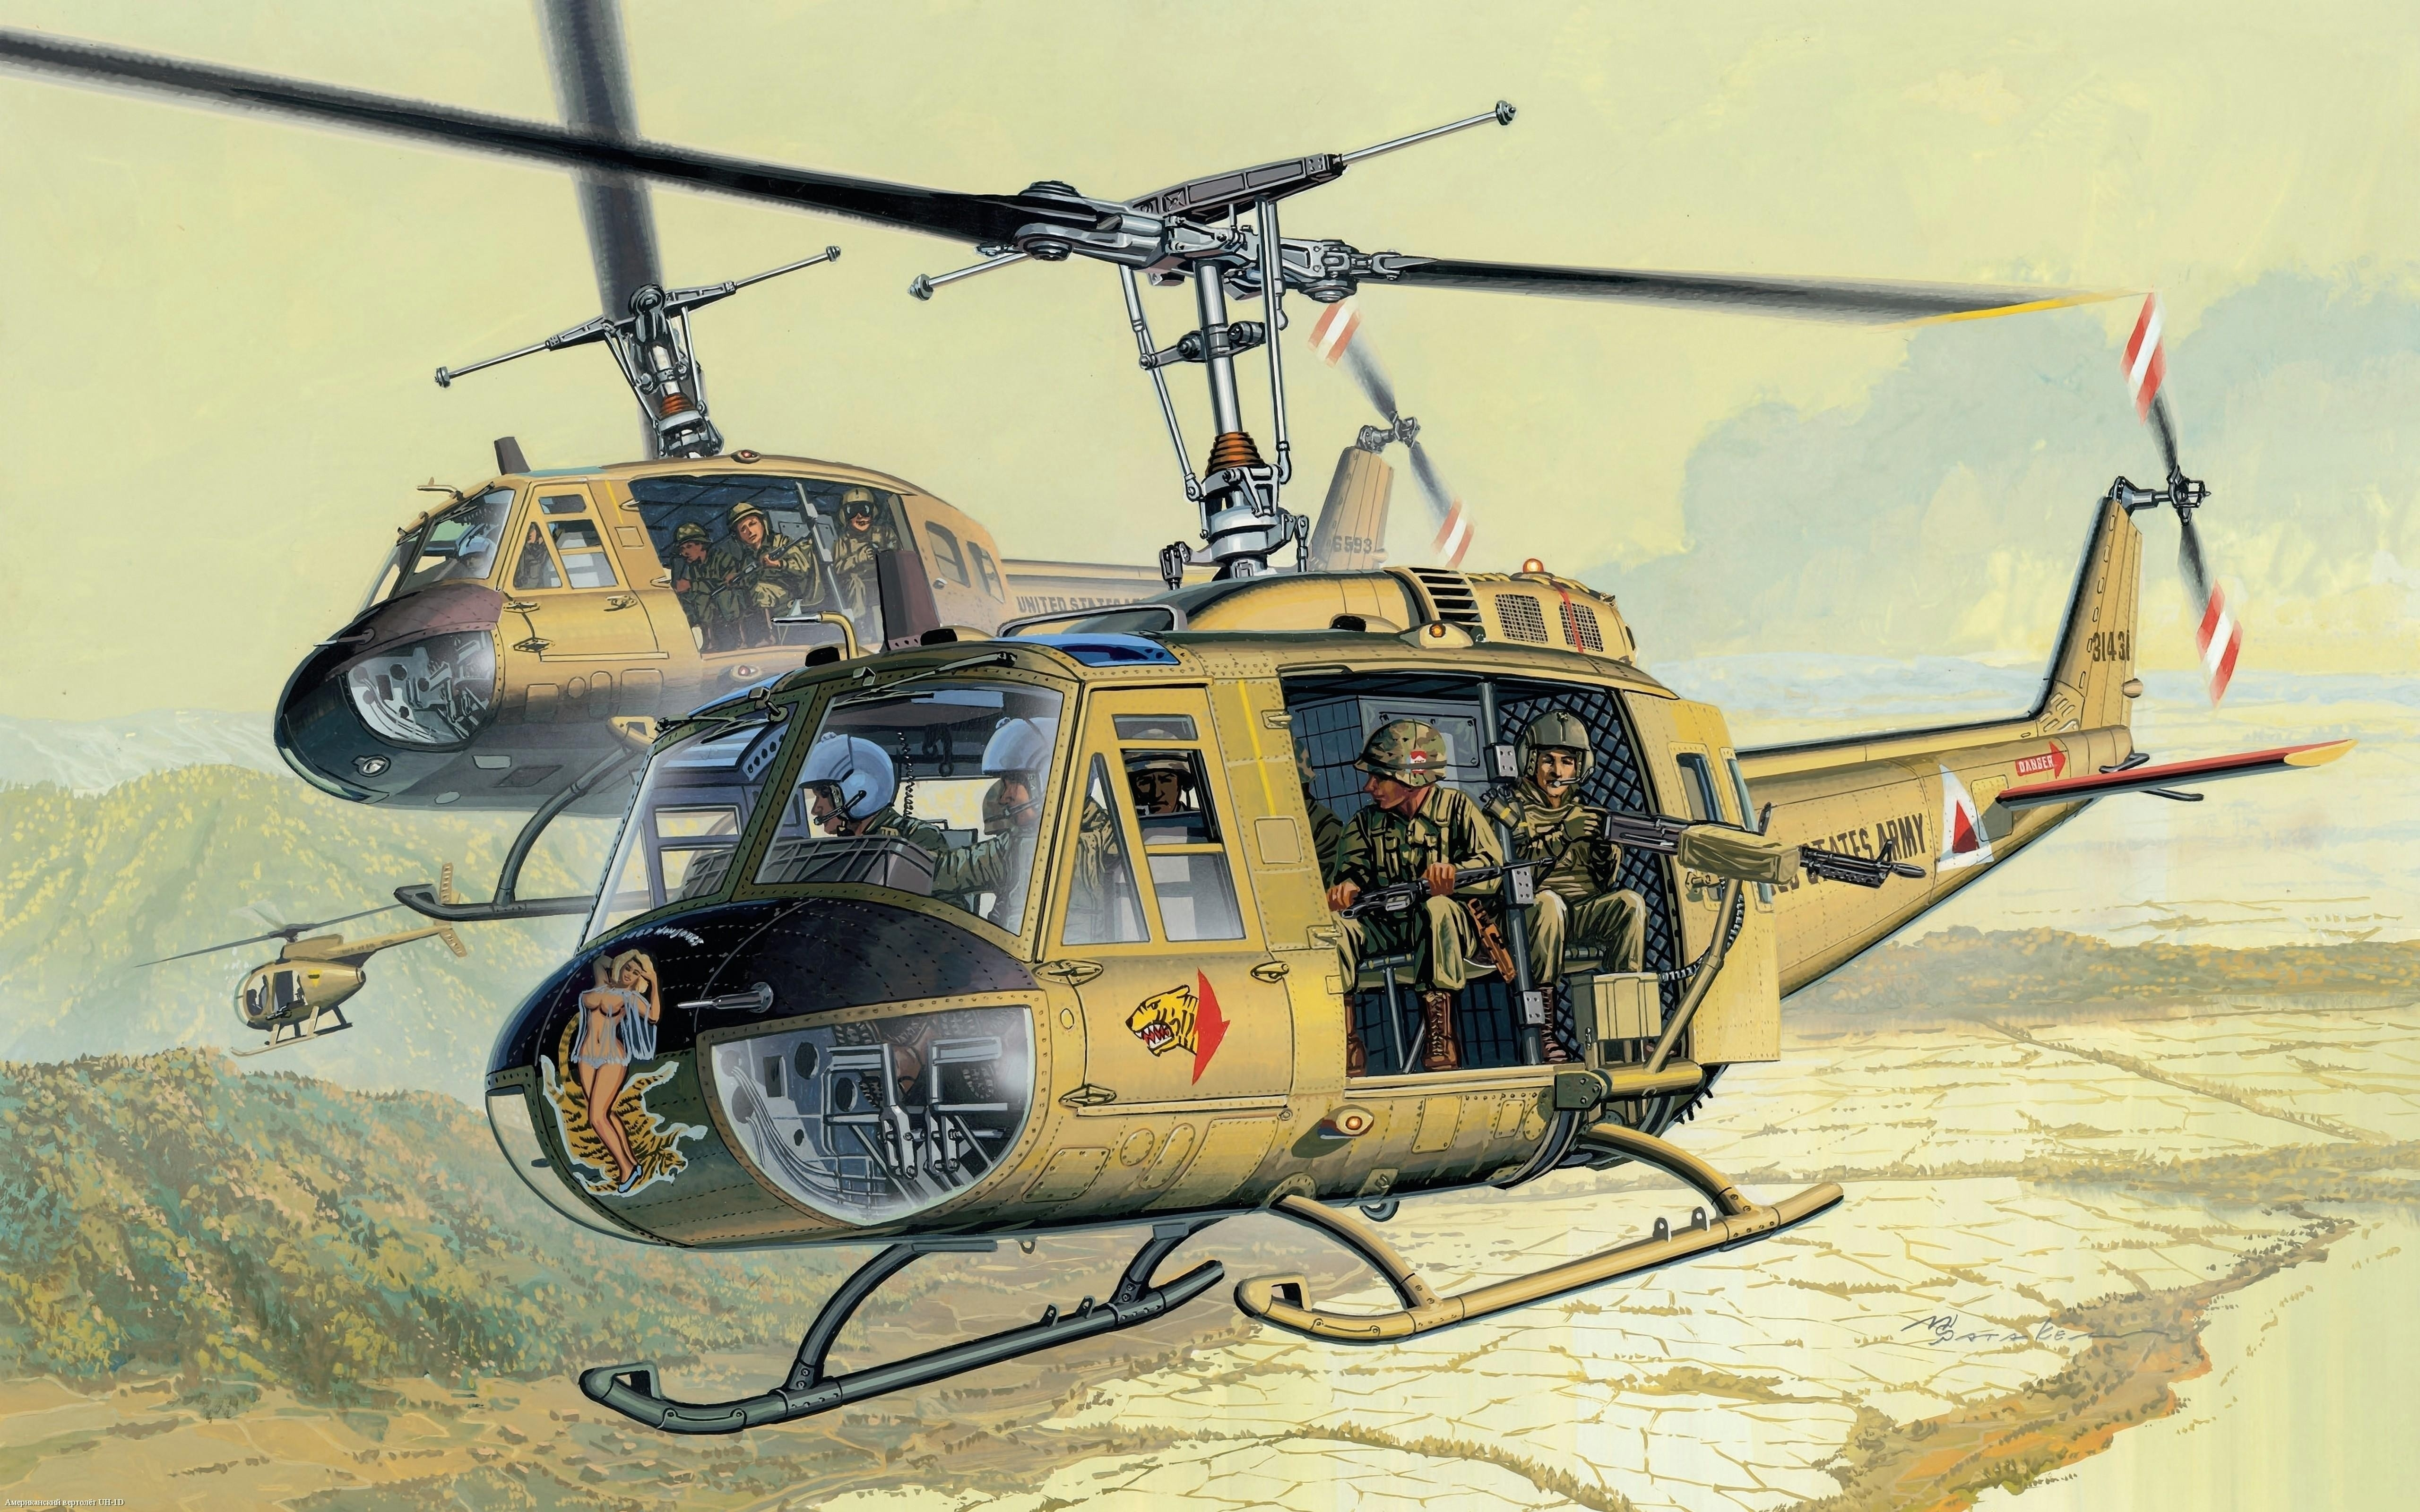 vietnam war 5120x3200 wallpaper Wallpaper Wallpapers Download 5120x3200